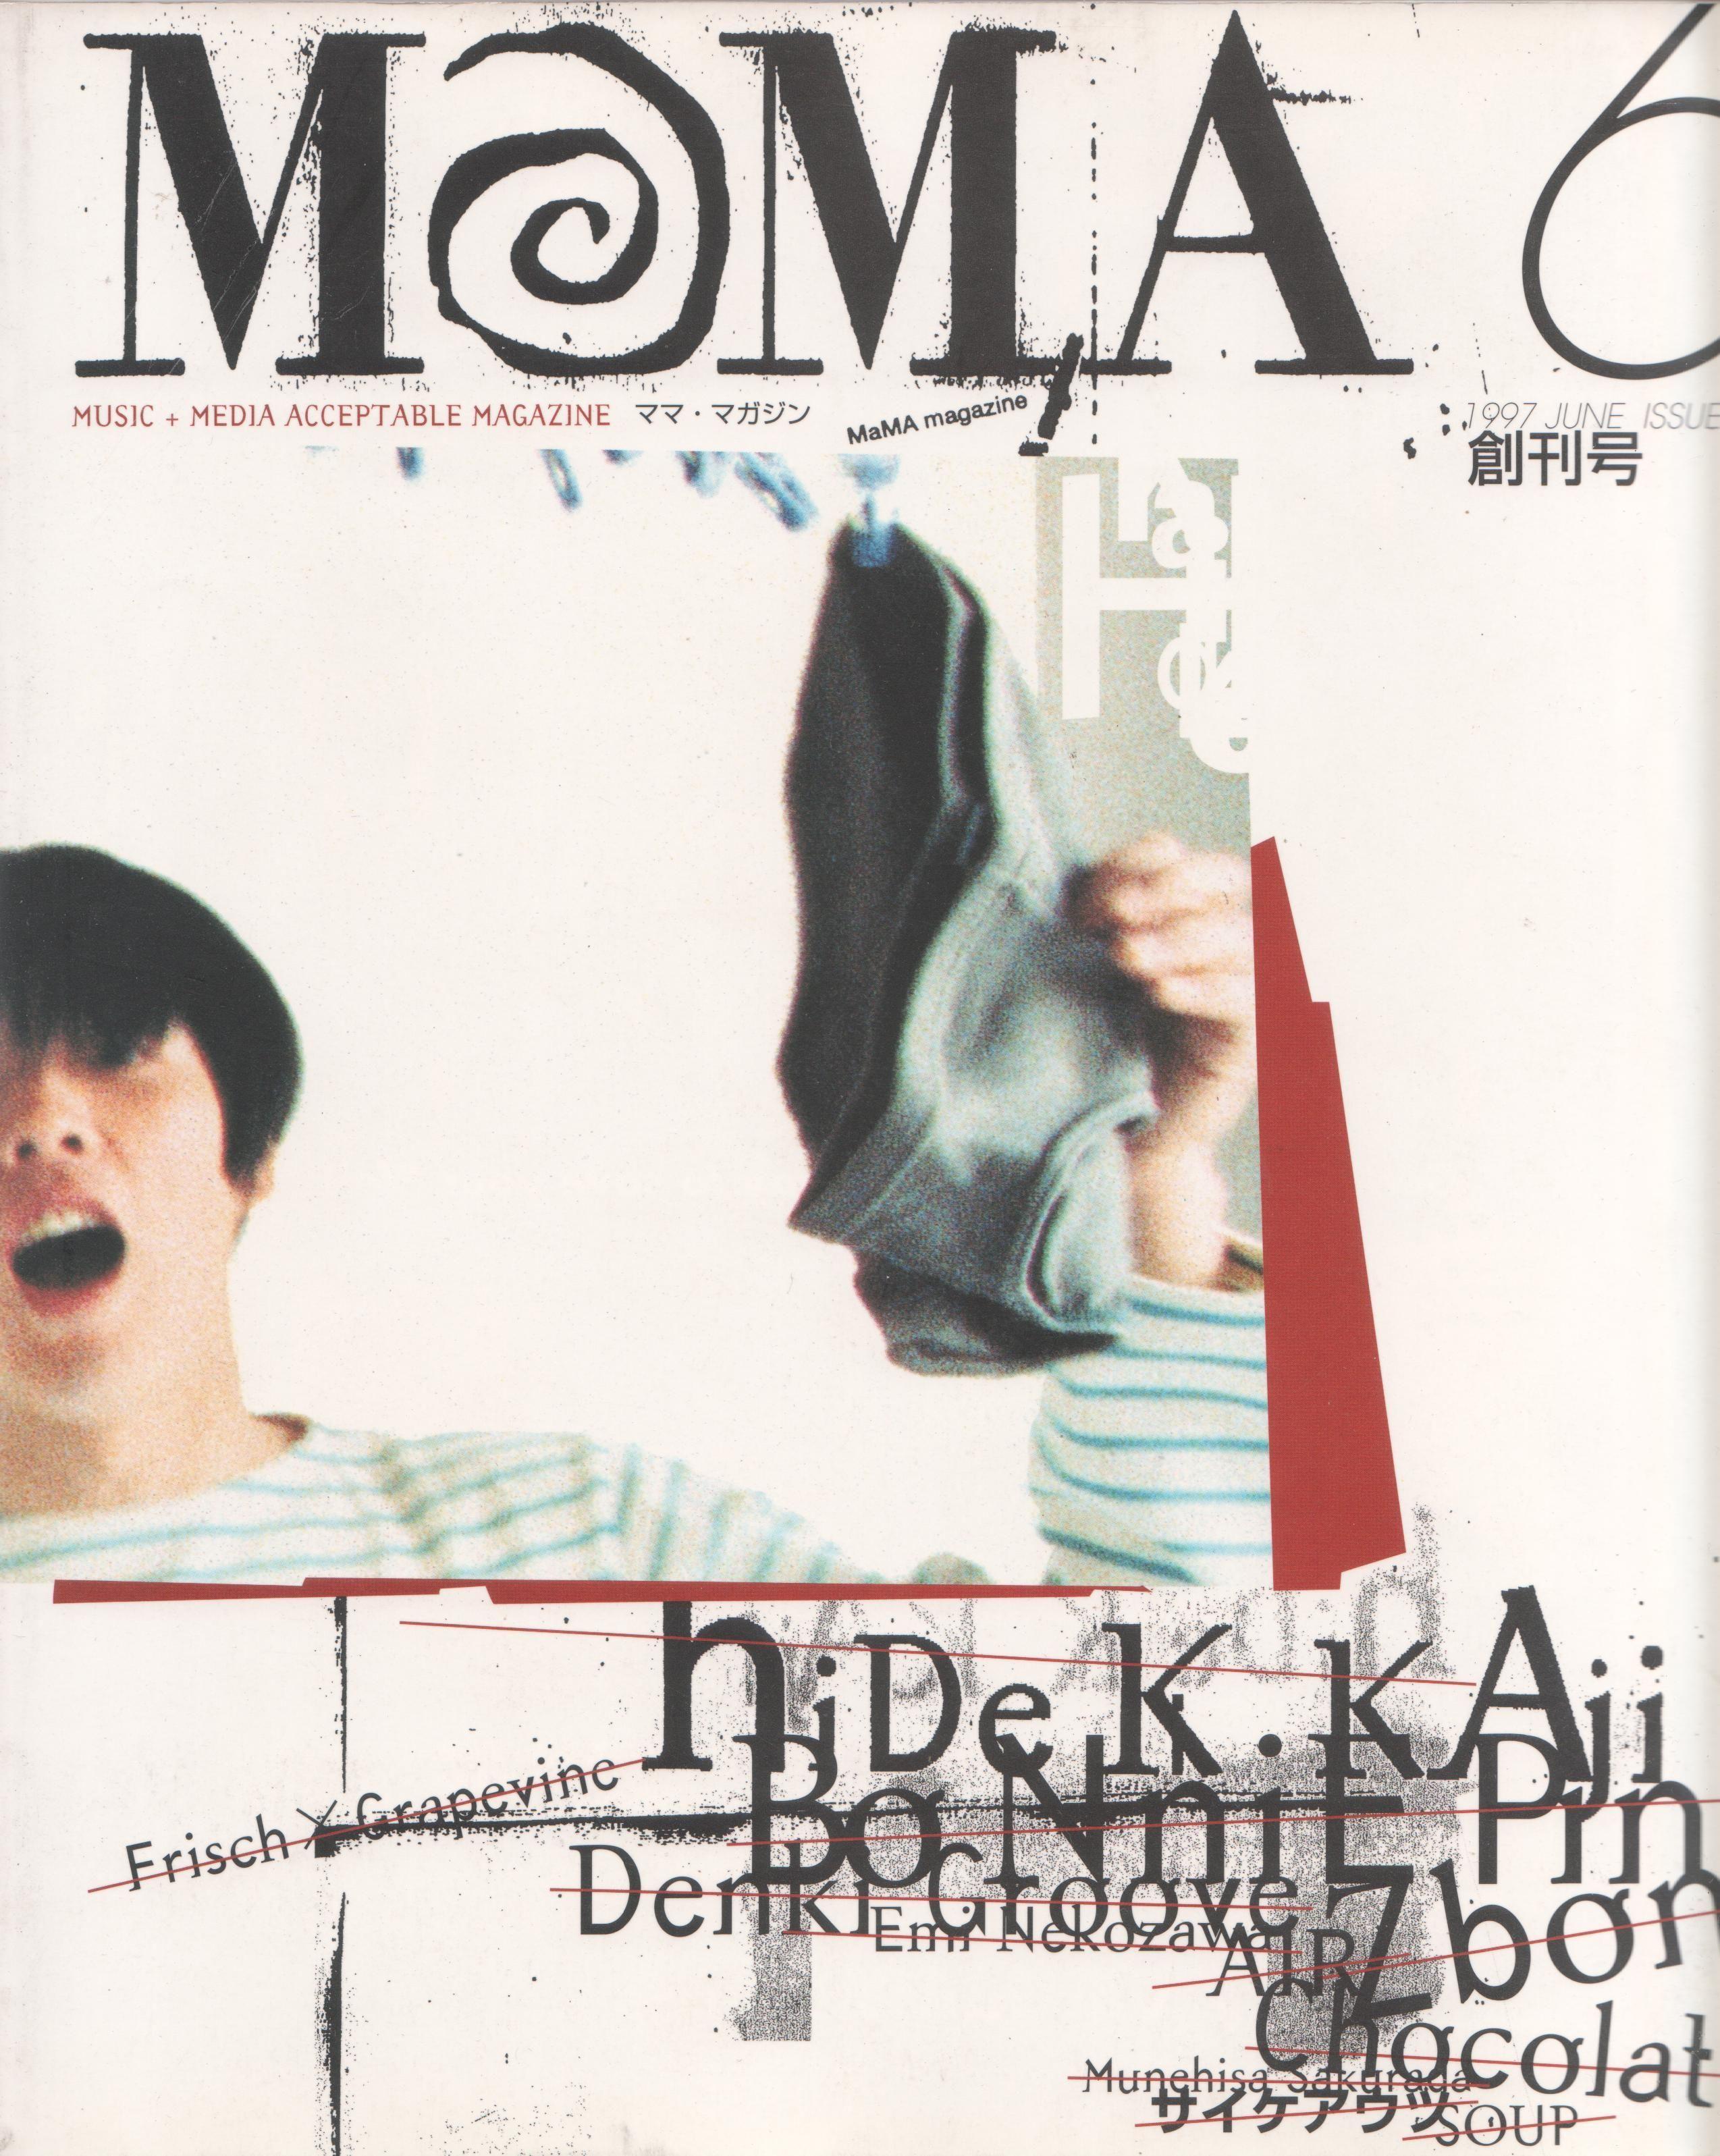 Mama magazine ママ・マガジン 1997年6月創刊号 ISSUE#1